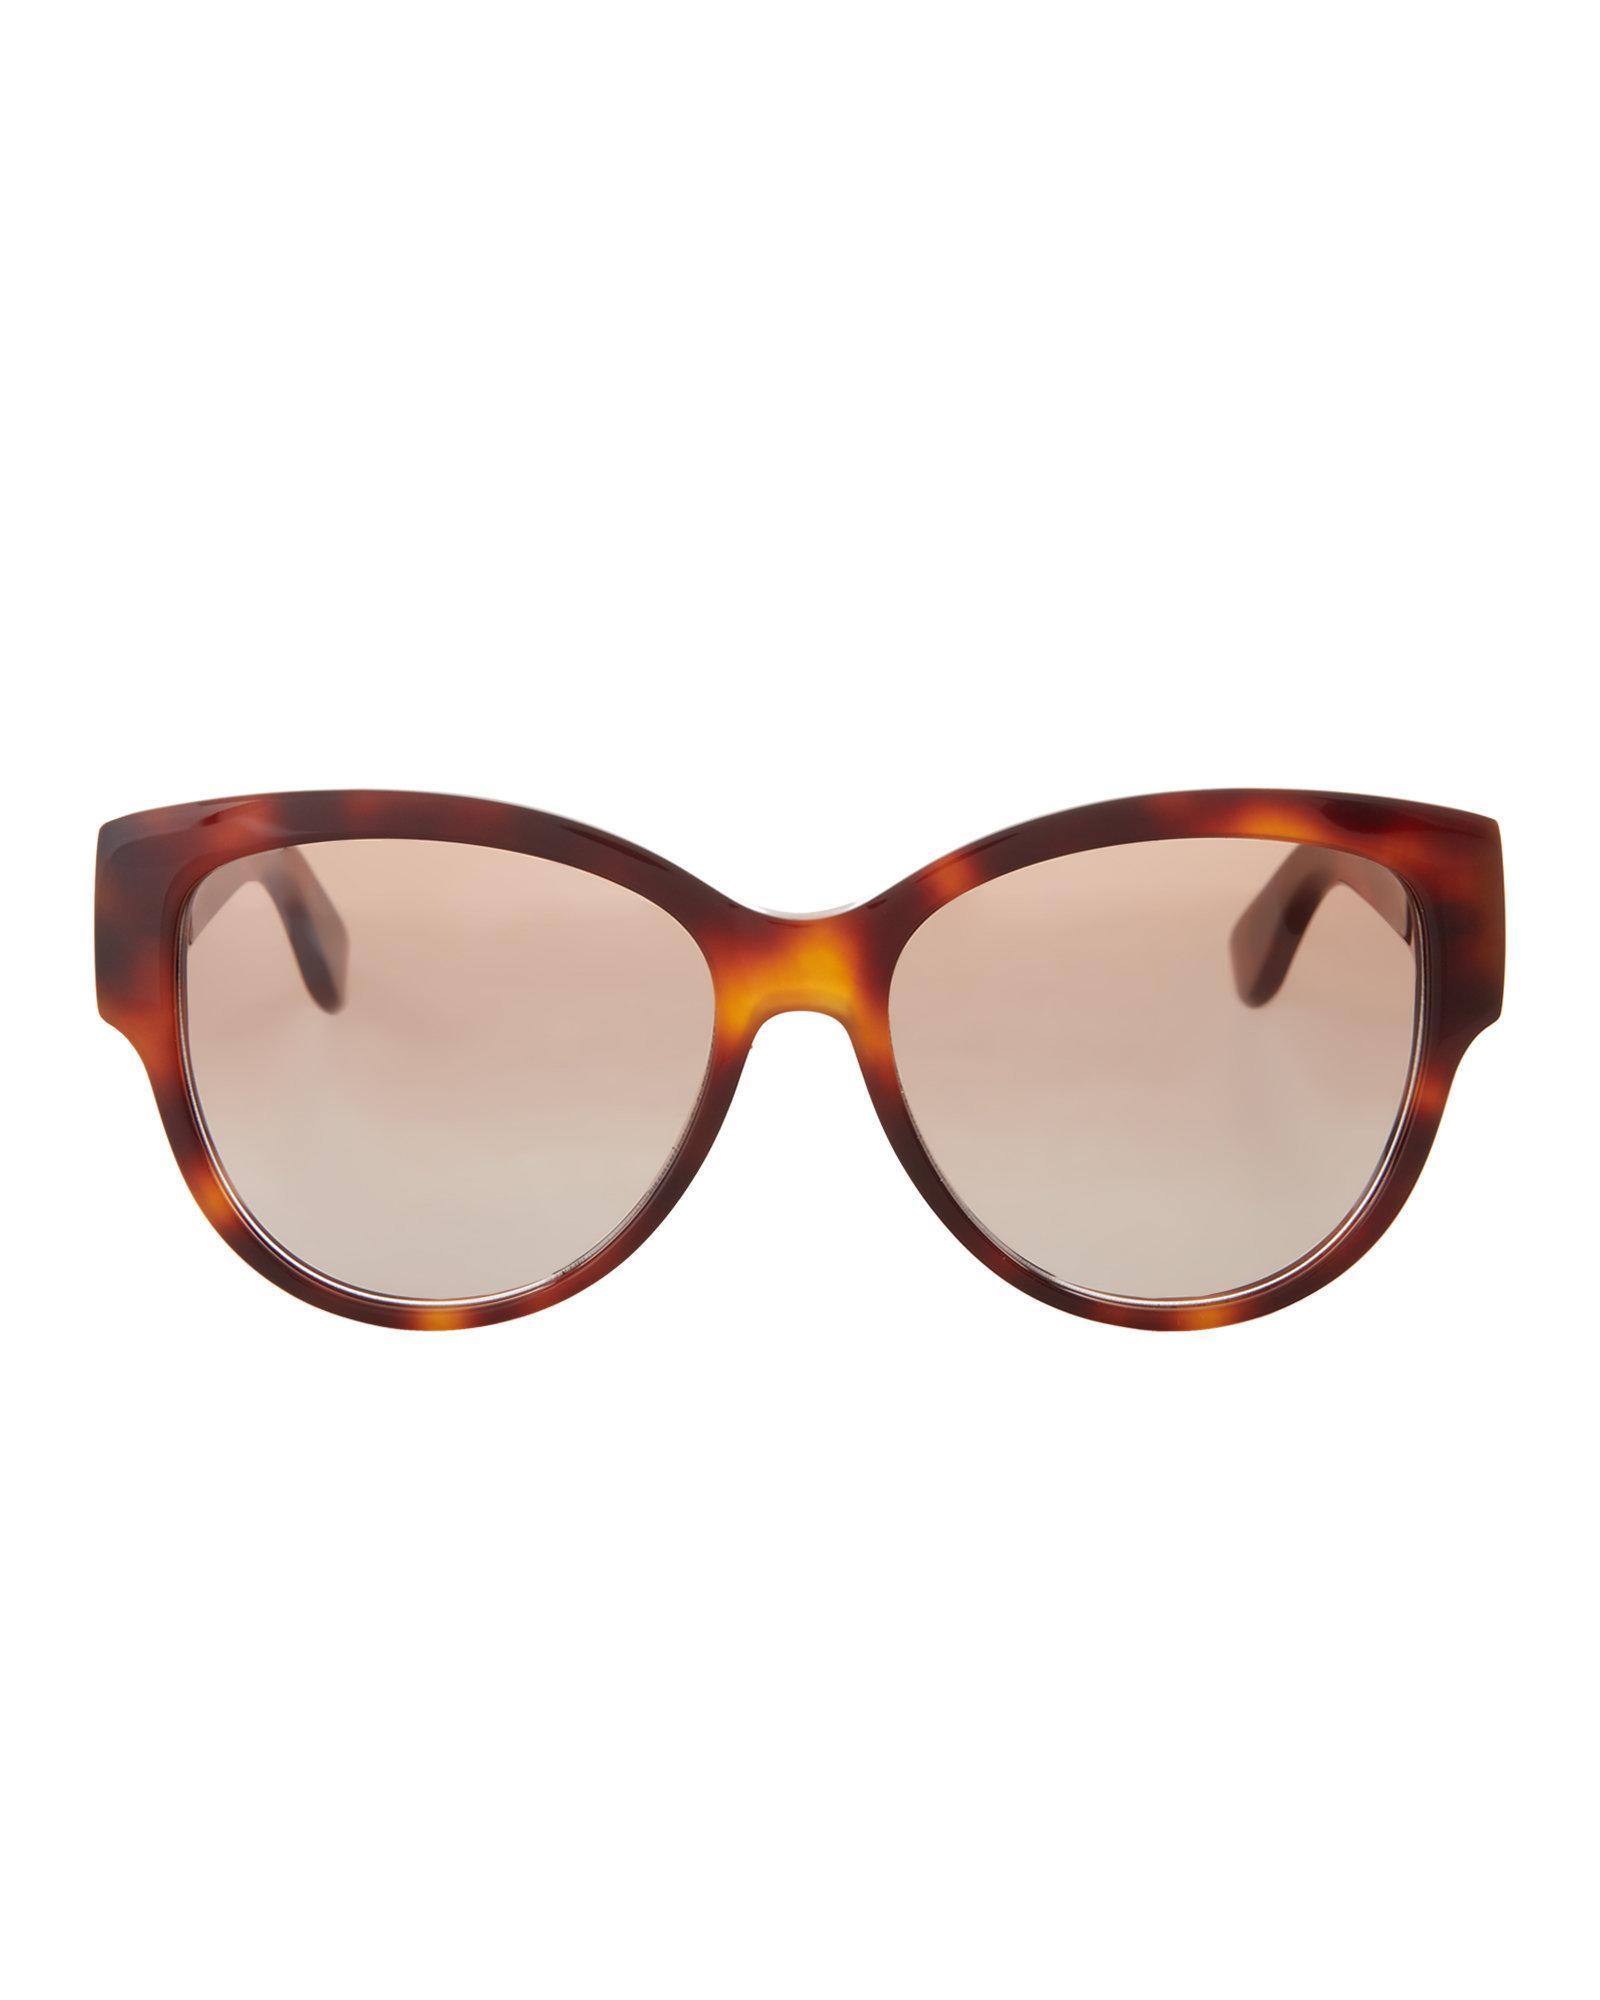 fc0c9efcec Lyst - Saint Laurent Slm3 Tortoiseshell-look Round Sunglasses in Brown